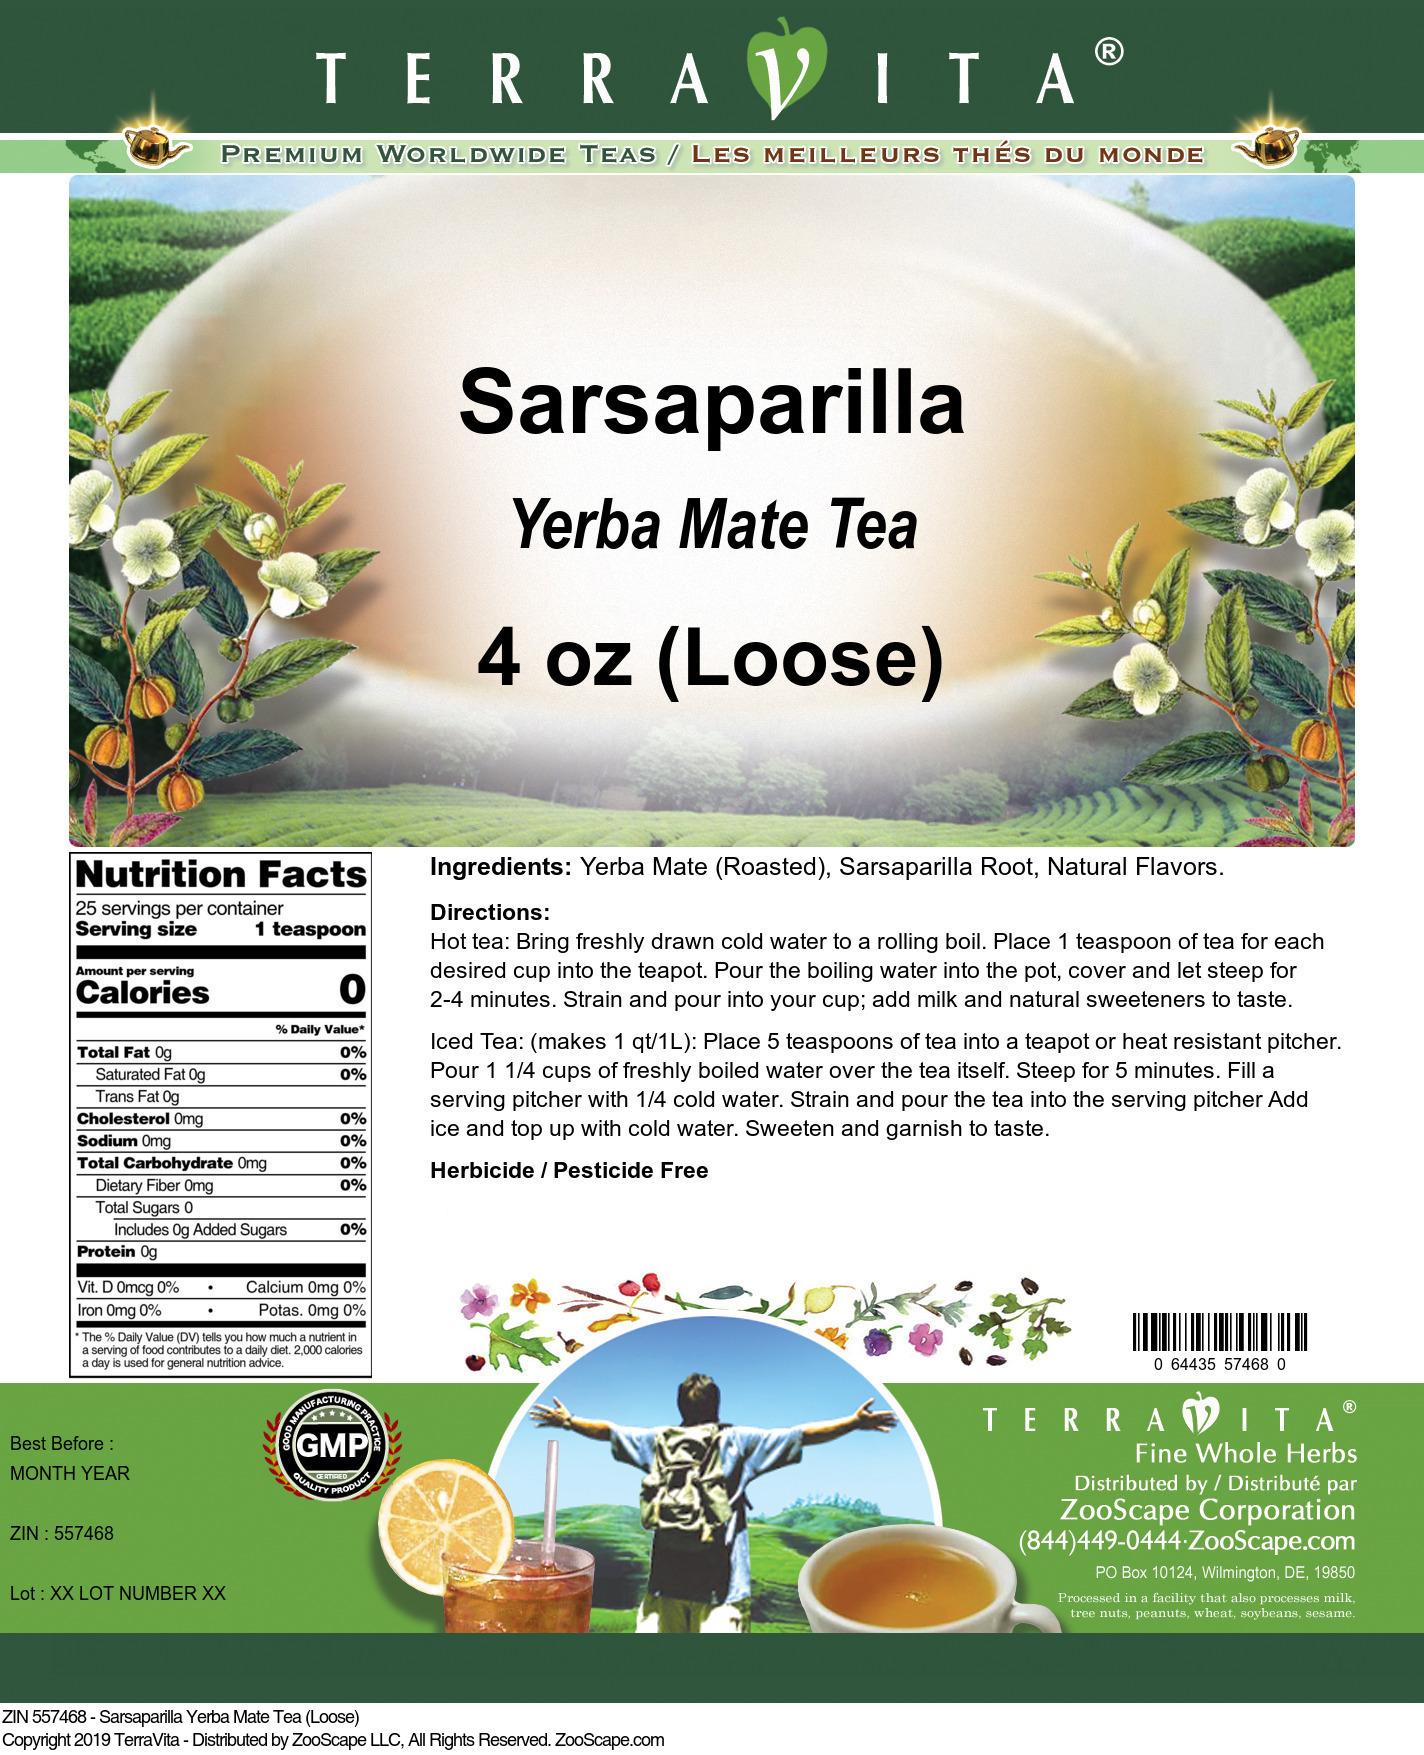 Sarsaparilla Yerba Mate Tea (Loose)